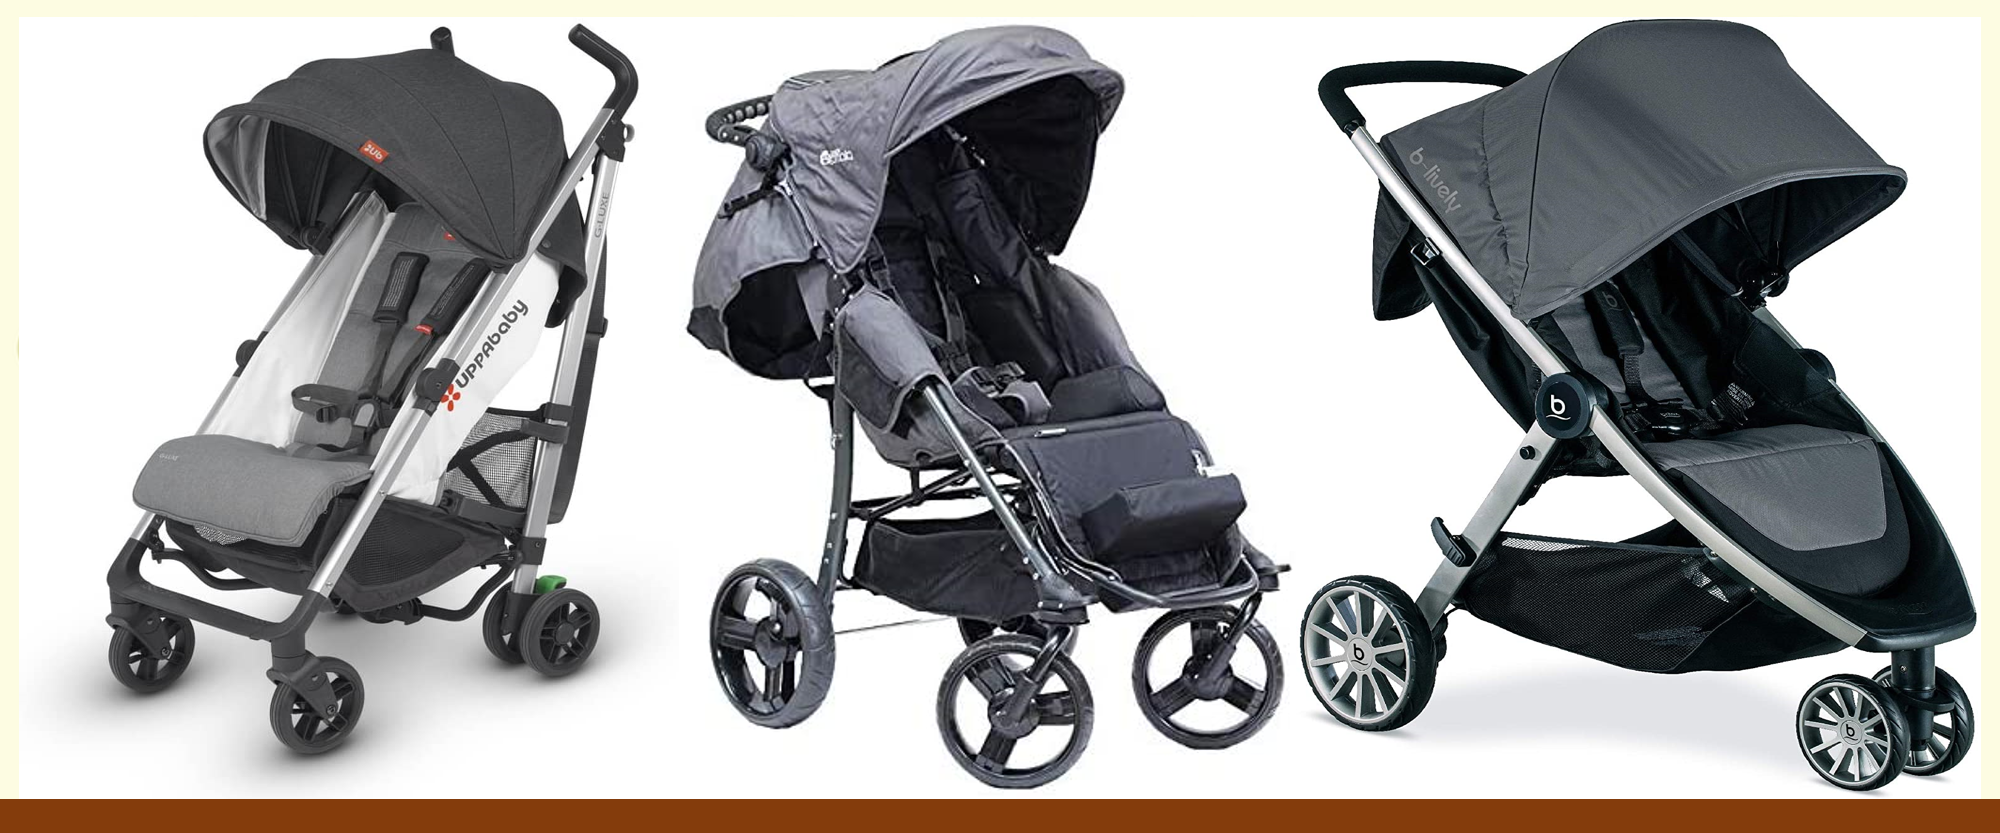 Best Strollers for Big Kids